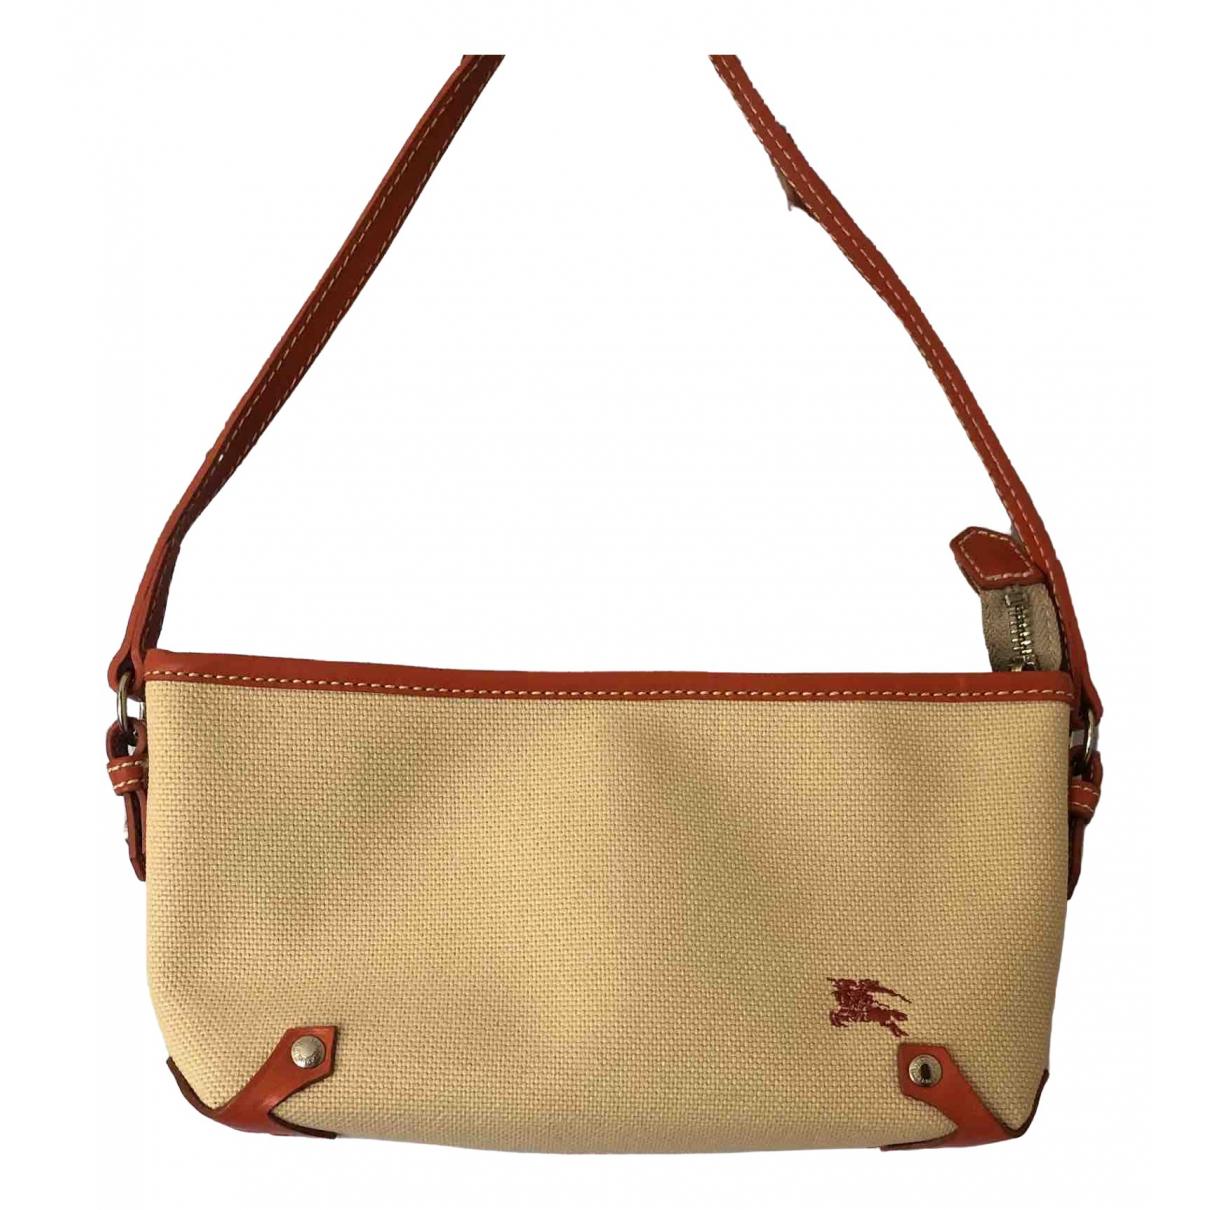 Burberry \N Cloth Clutch bag for Women \N